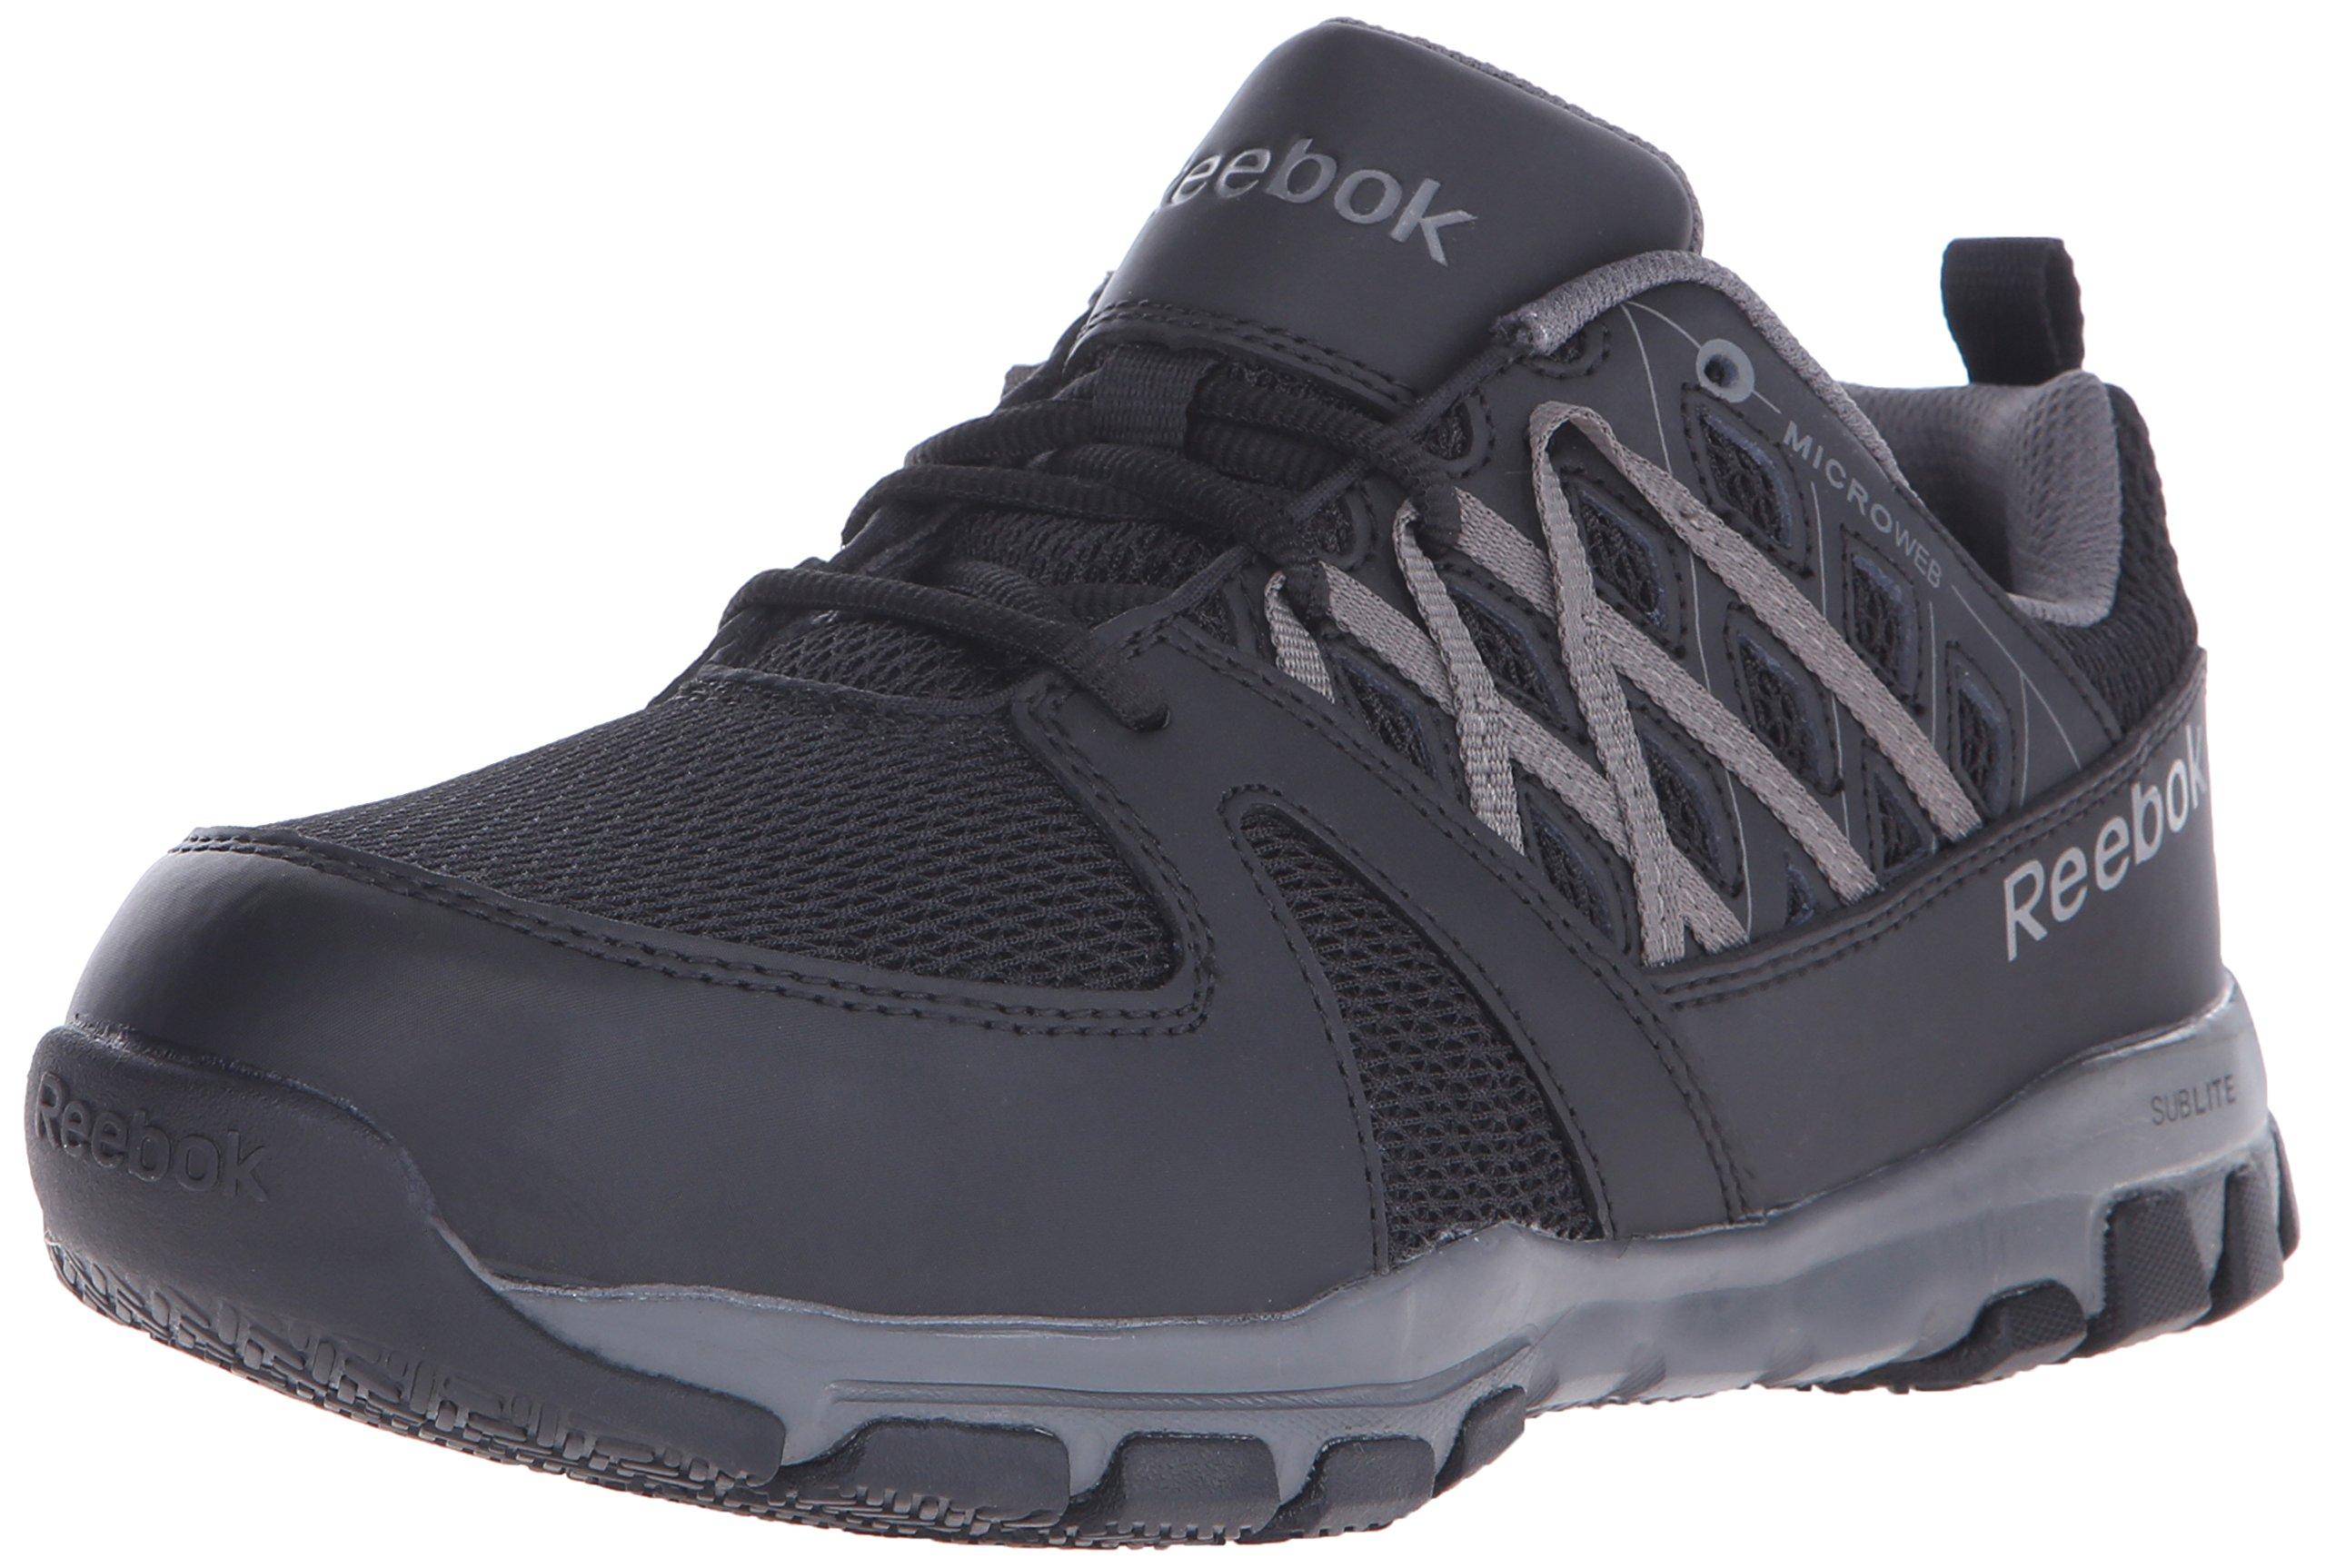 Reebok Work Men's Sublite RB4016 Work Shoe, Black, 10.5 W US by Reebok Work